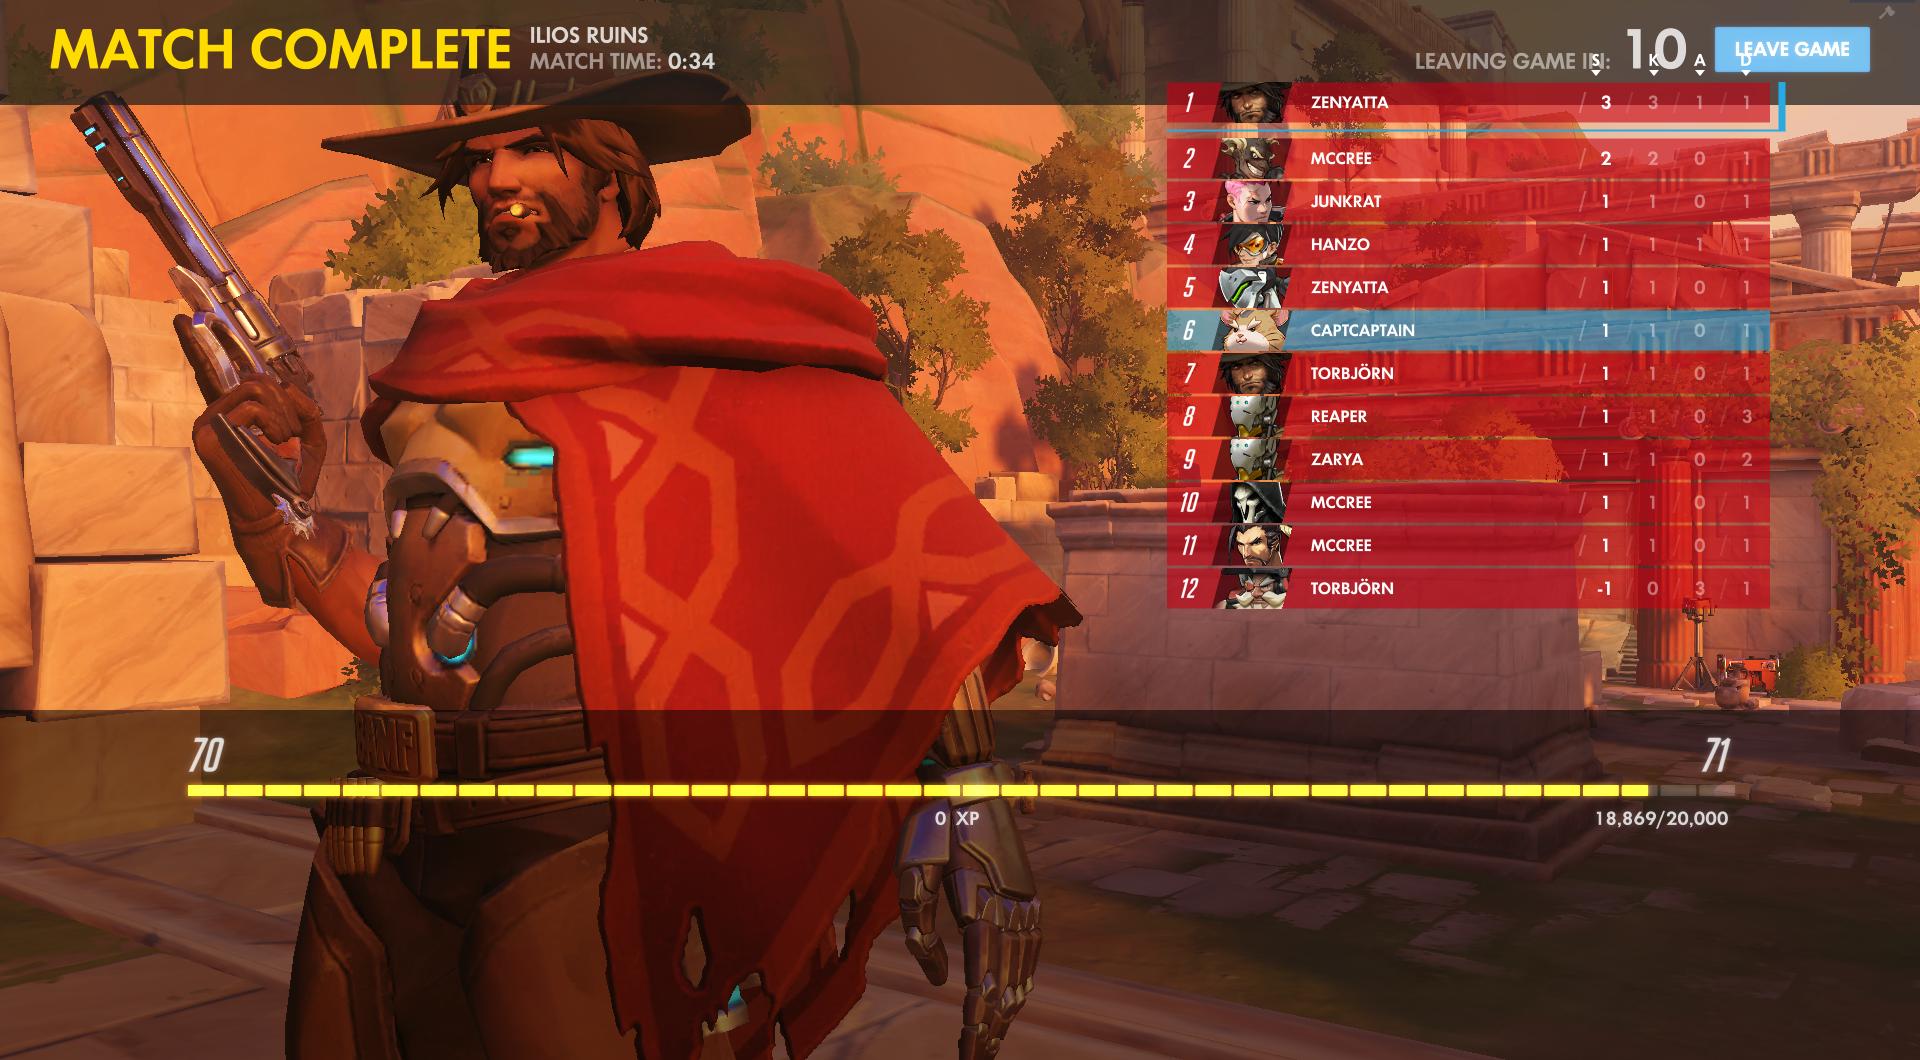 Victory Pose + Scoreboard